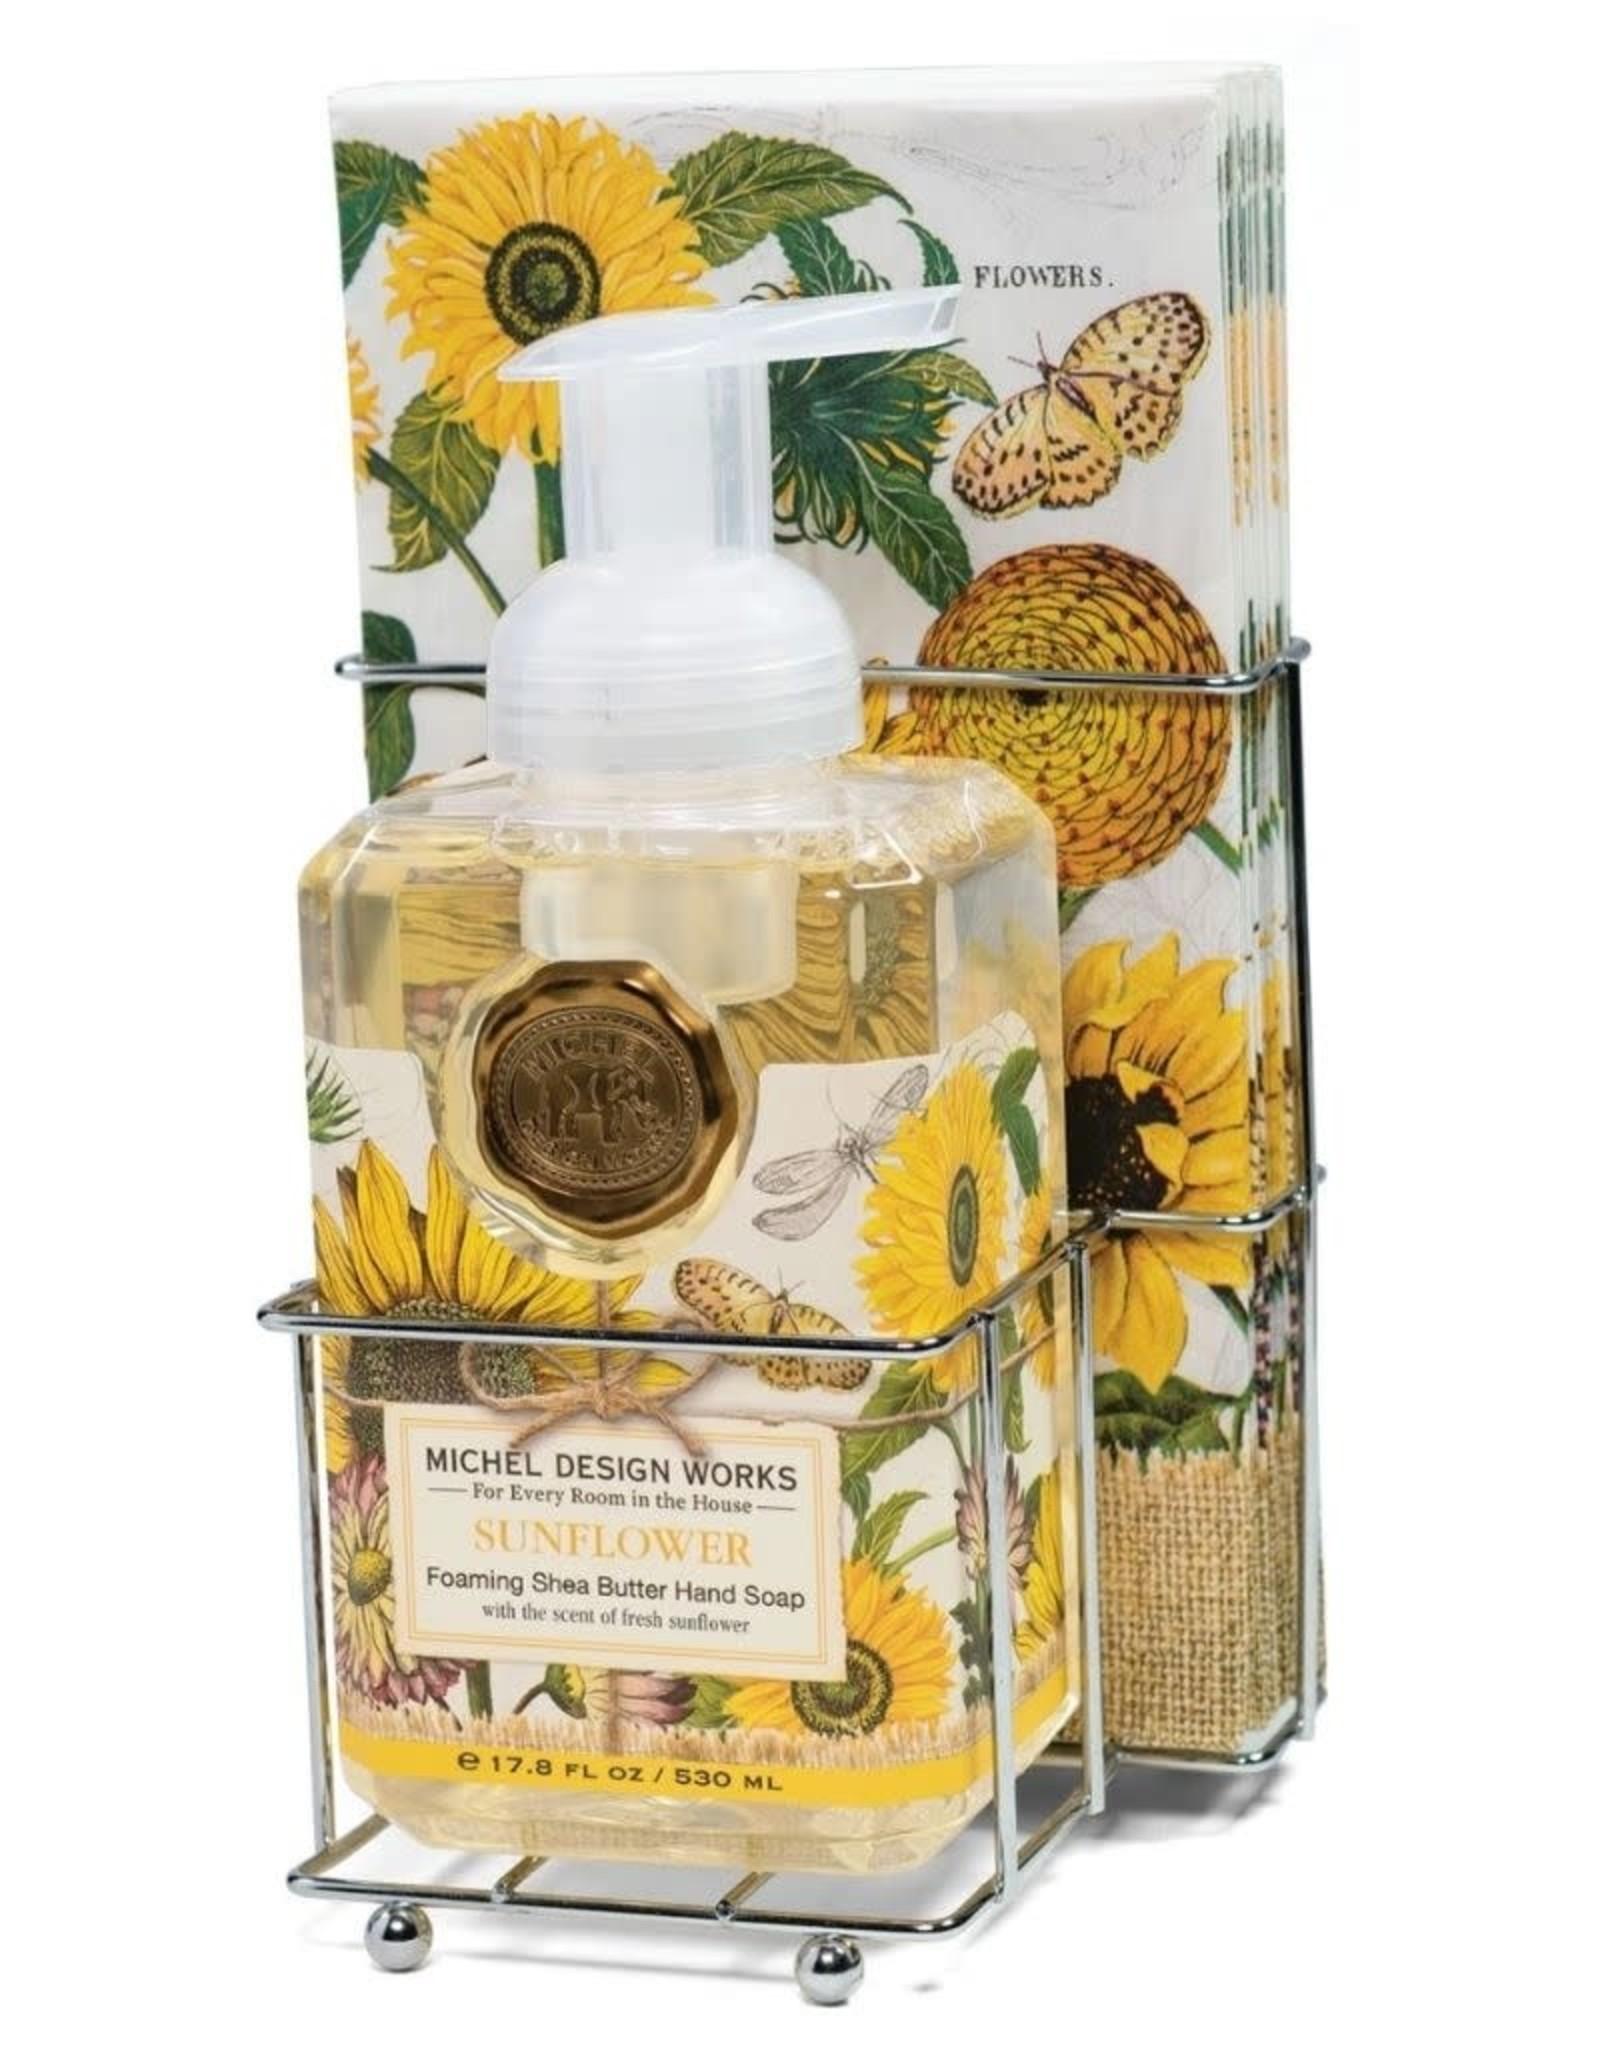 Sunflower Foaming Soap Napkin Set